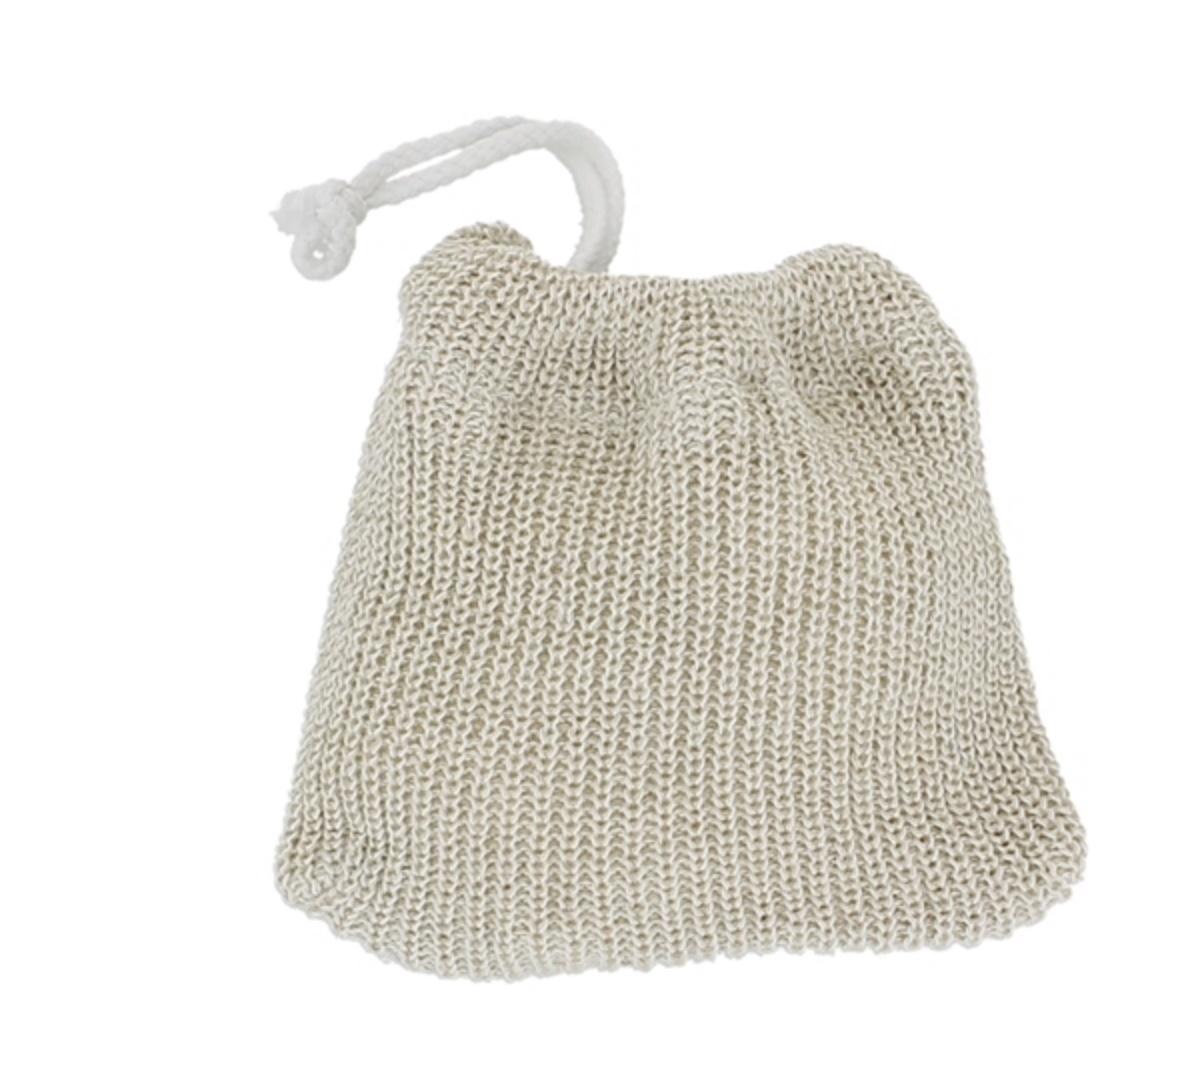 Forsters Fine Soap Bag